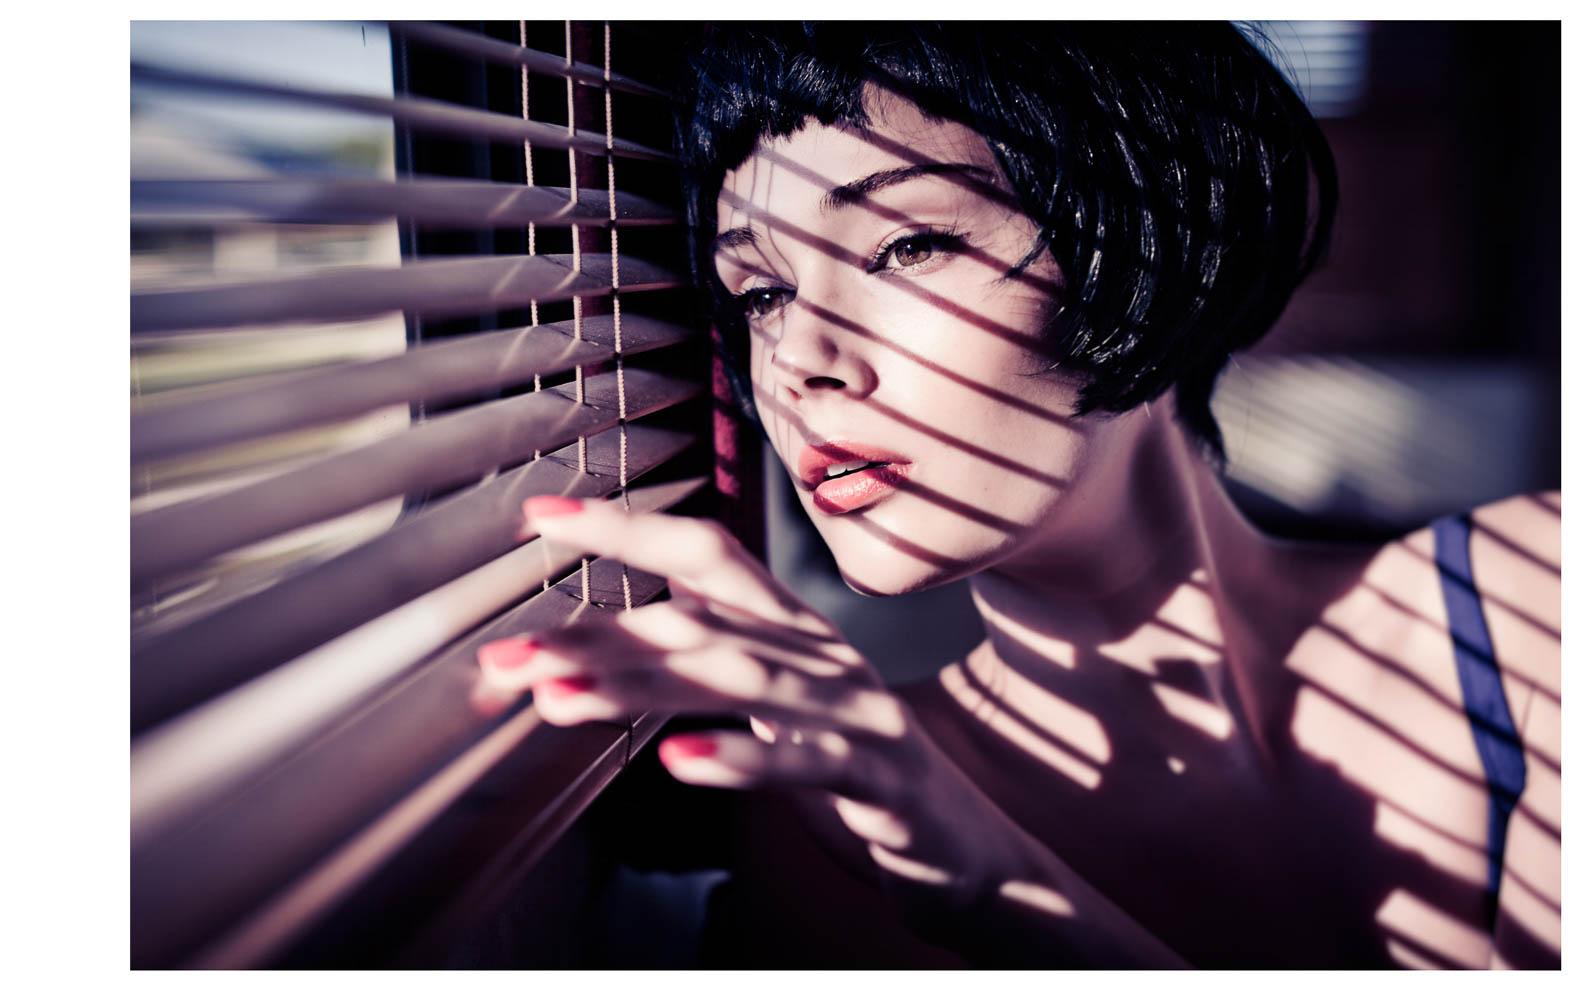 Photography - Photograph